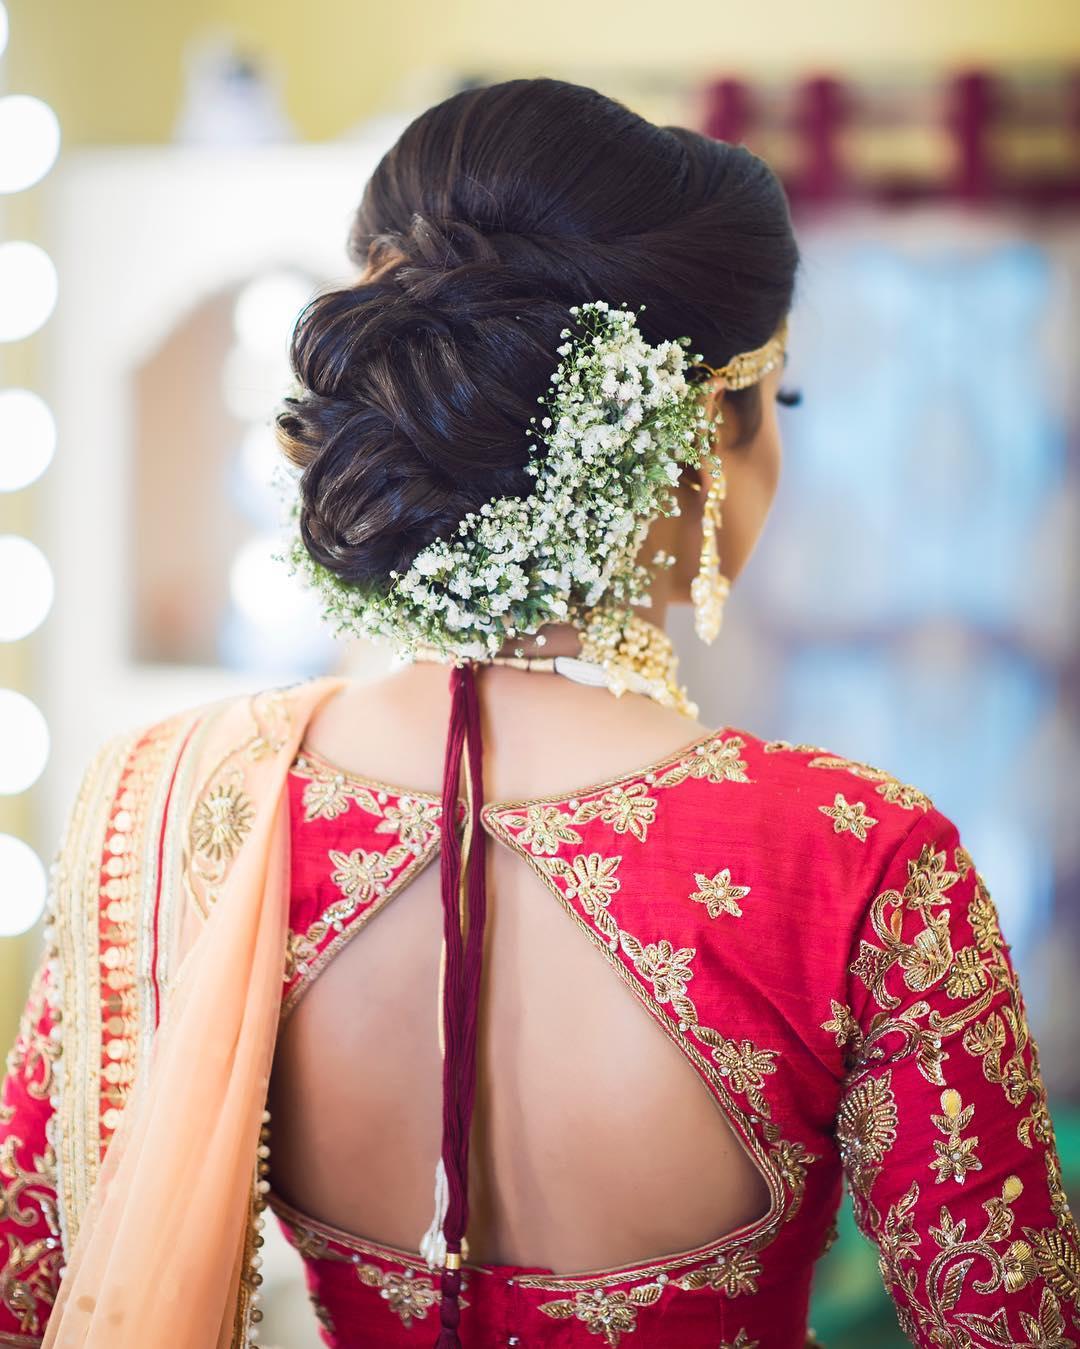 Floral Bun Hairstyles for Brides Mini flowers bun: